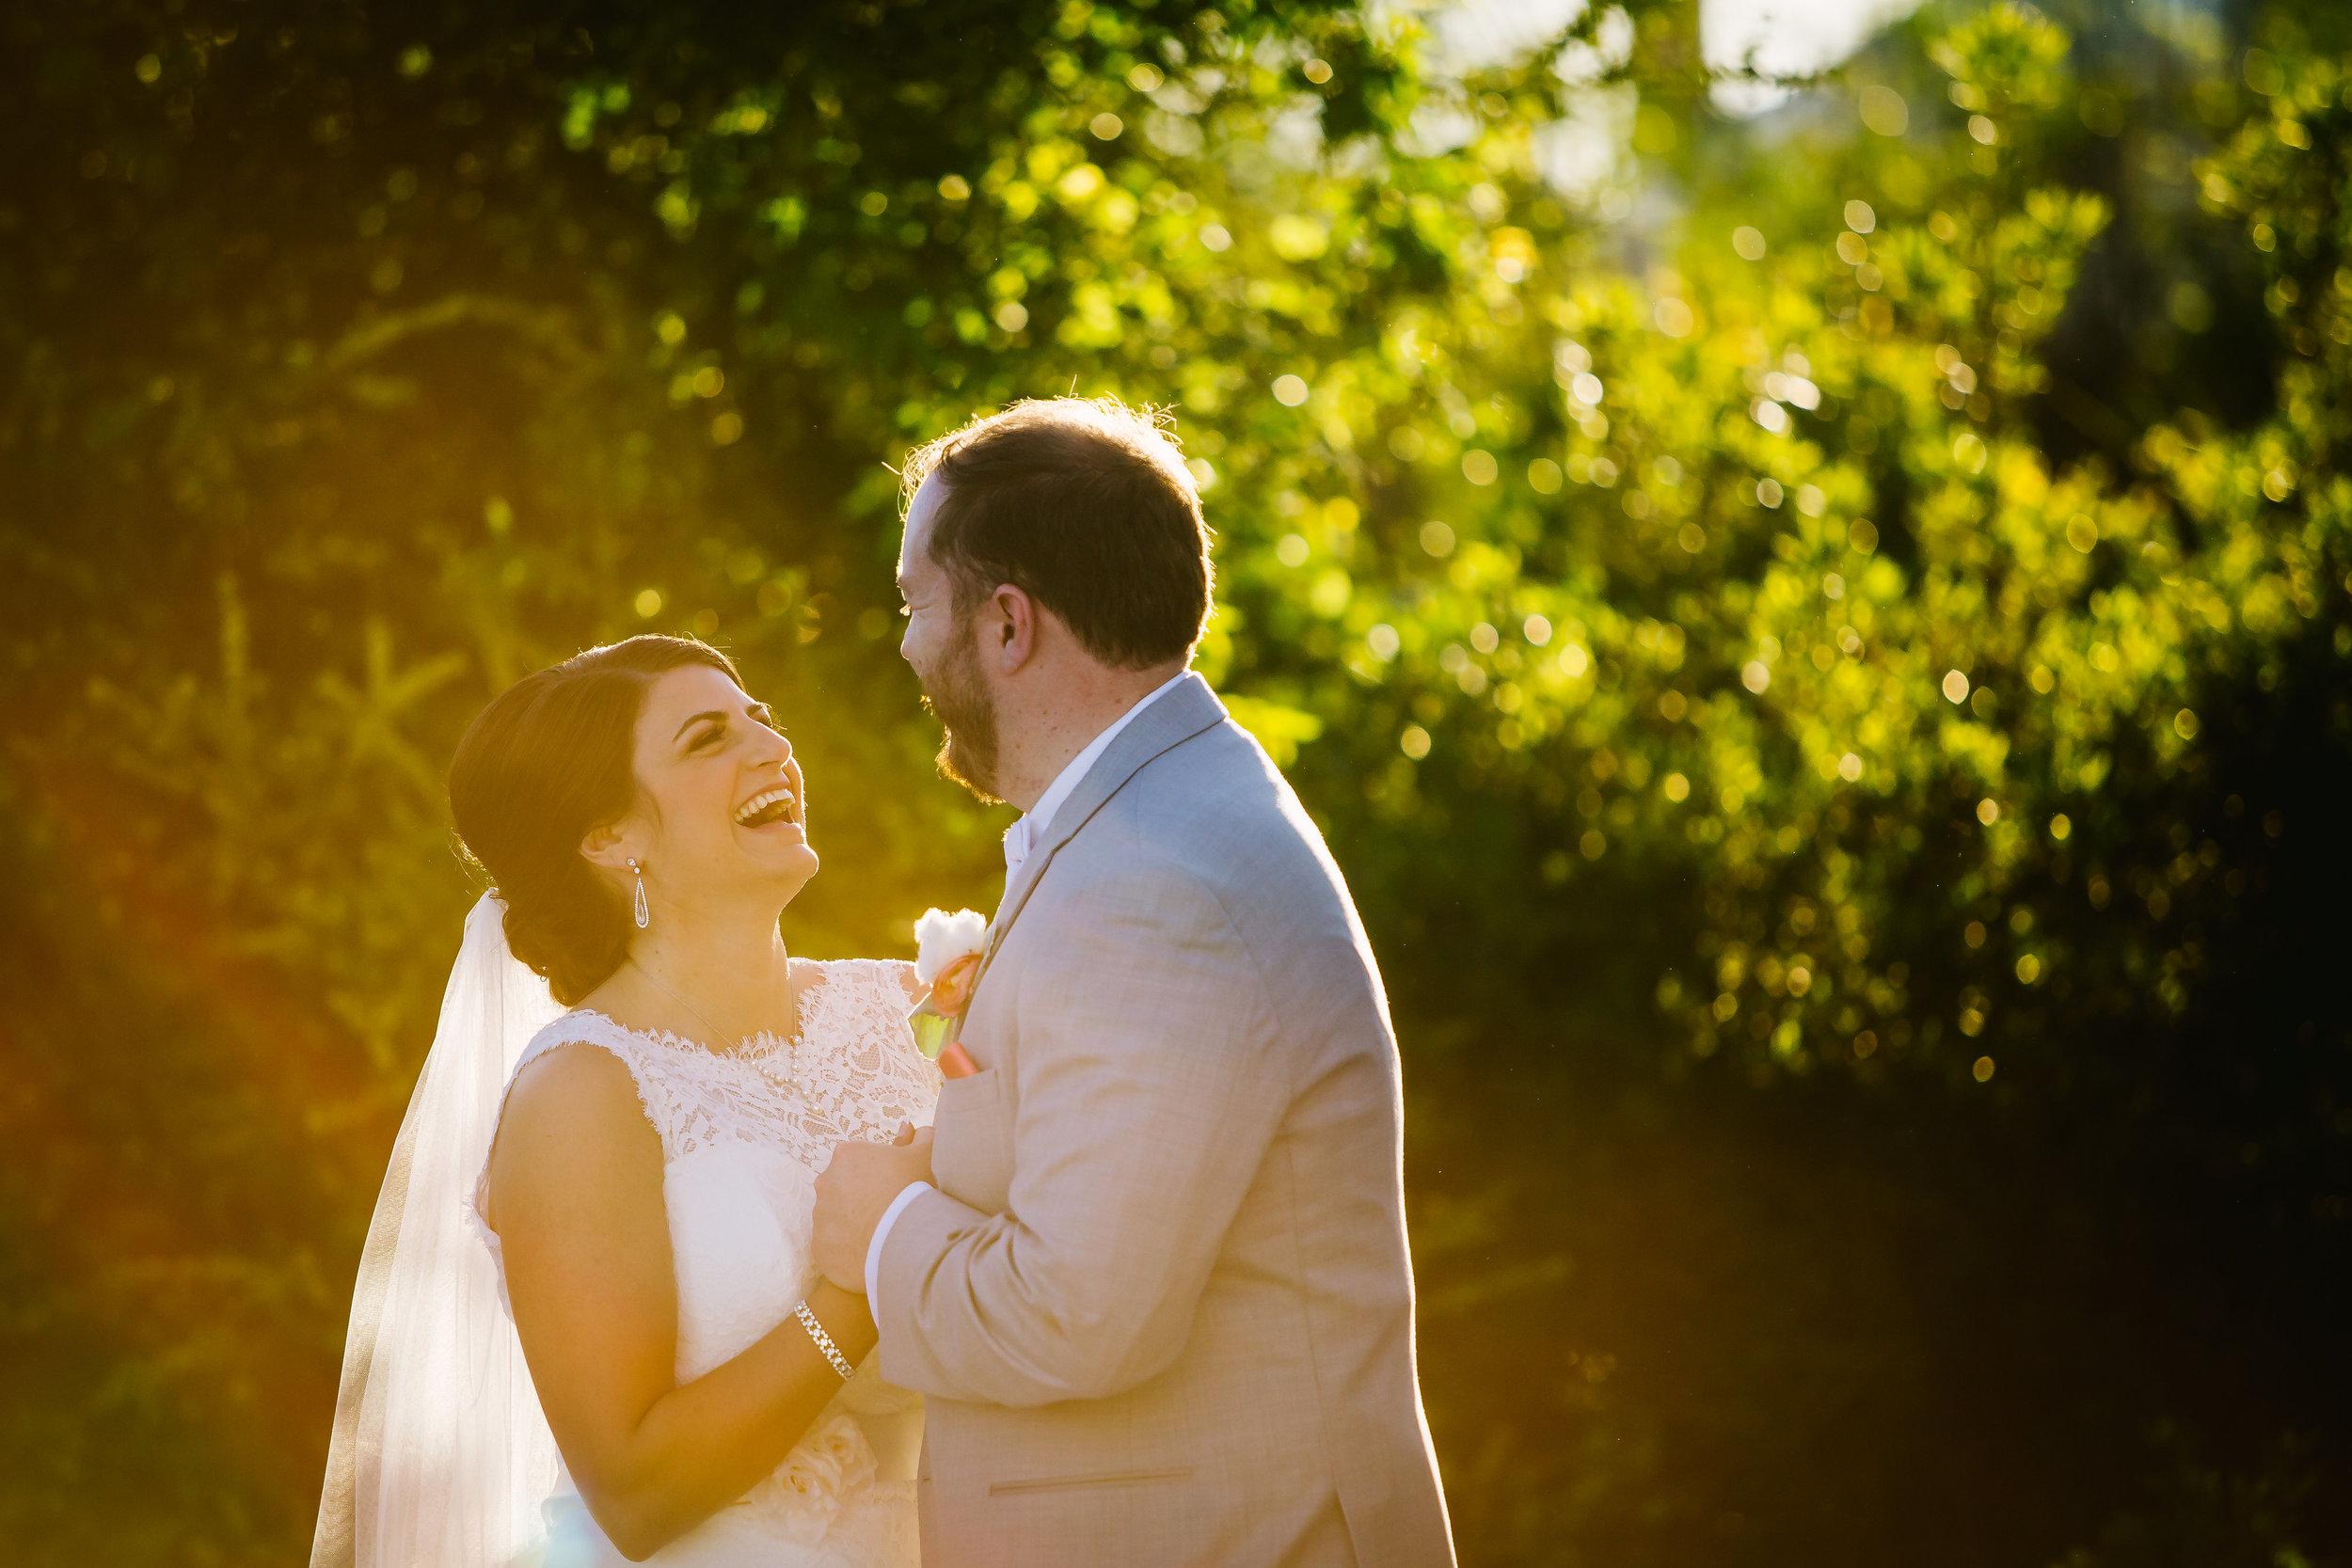 CHARLESTON WEDDING, ISLE OF PALMS, DESTINATION WEDDING , WILD DUNES RESORT, BEACH WEDDING, LOWCOUNTRY WEDDING, DREAMPOP MEDIA